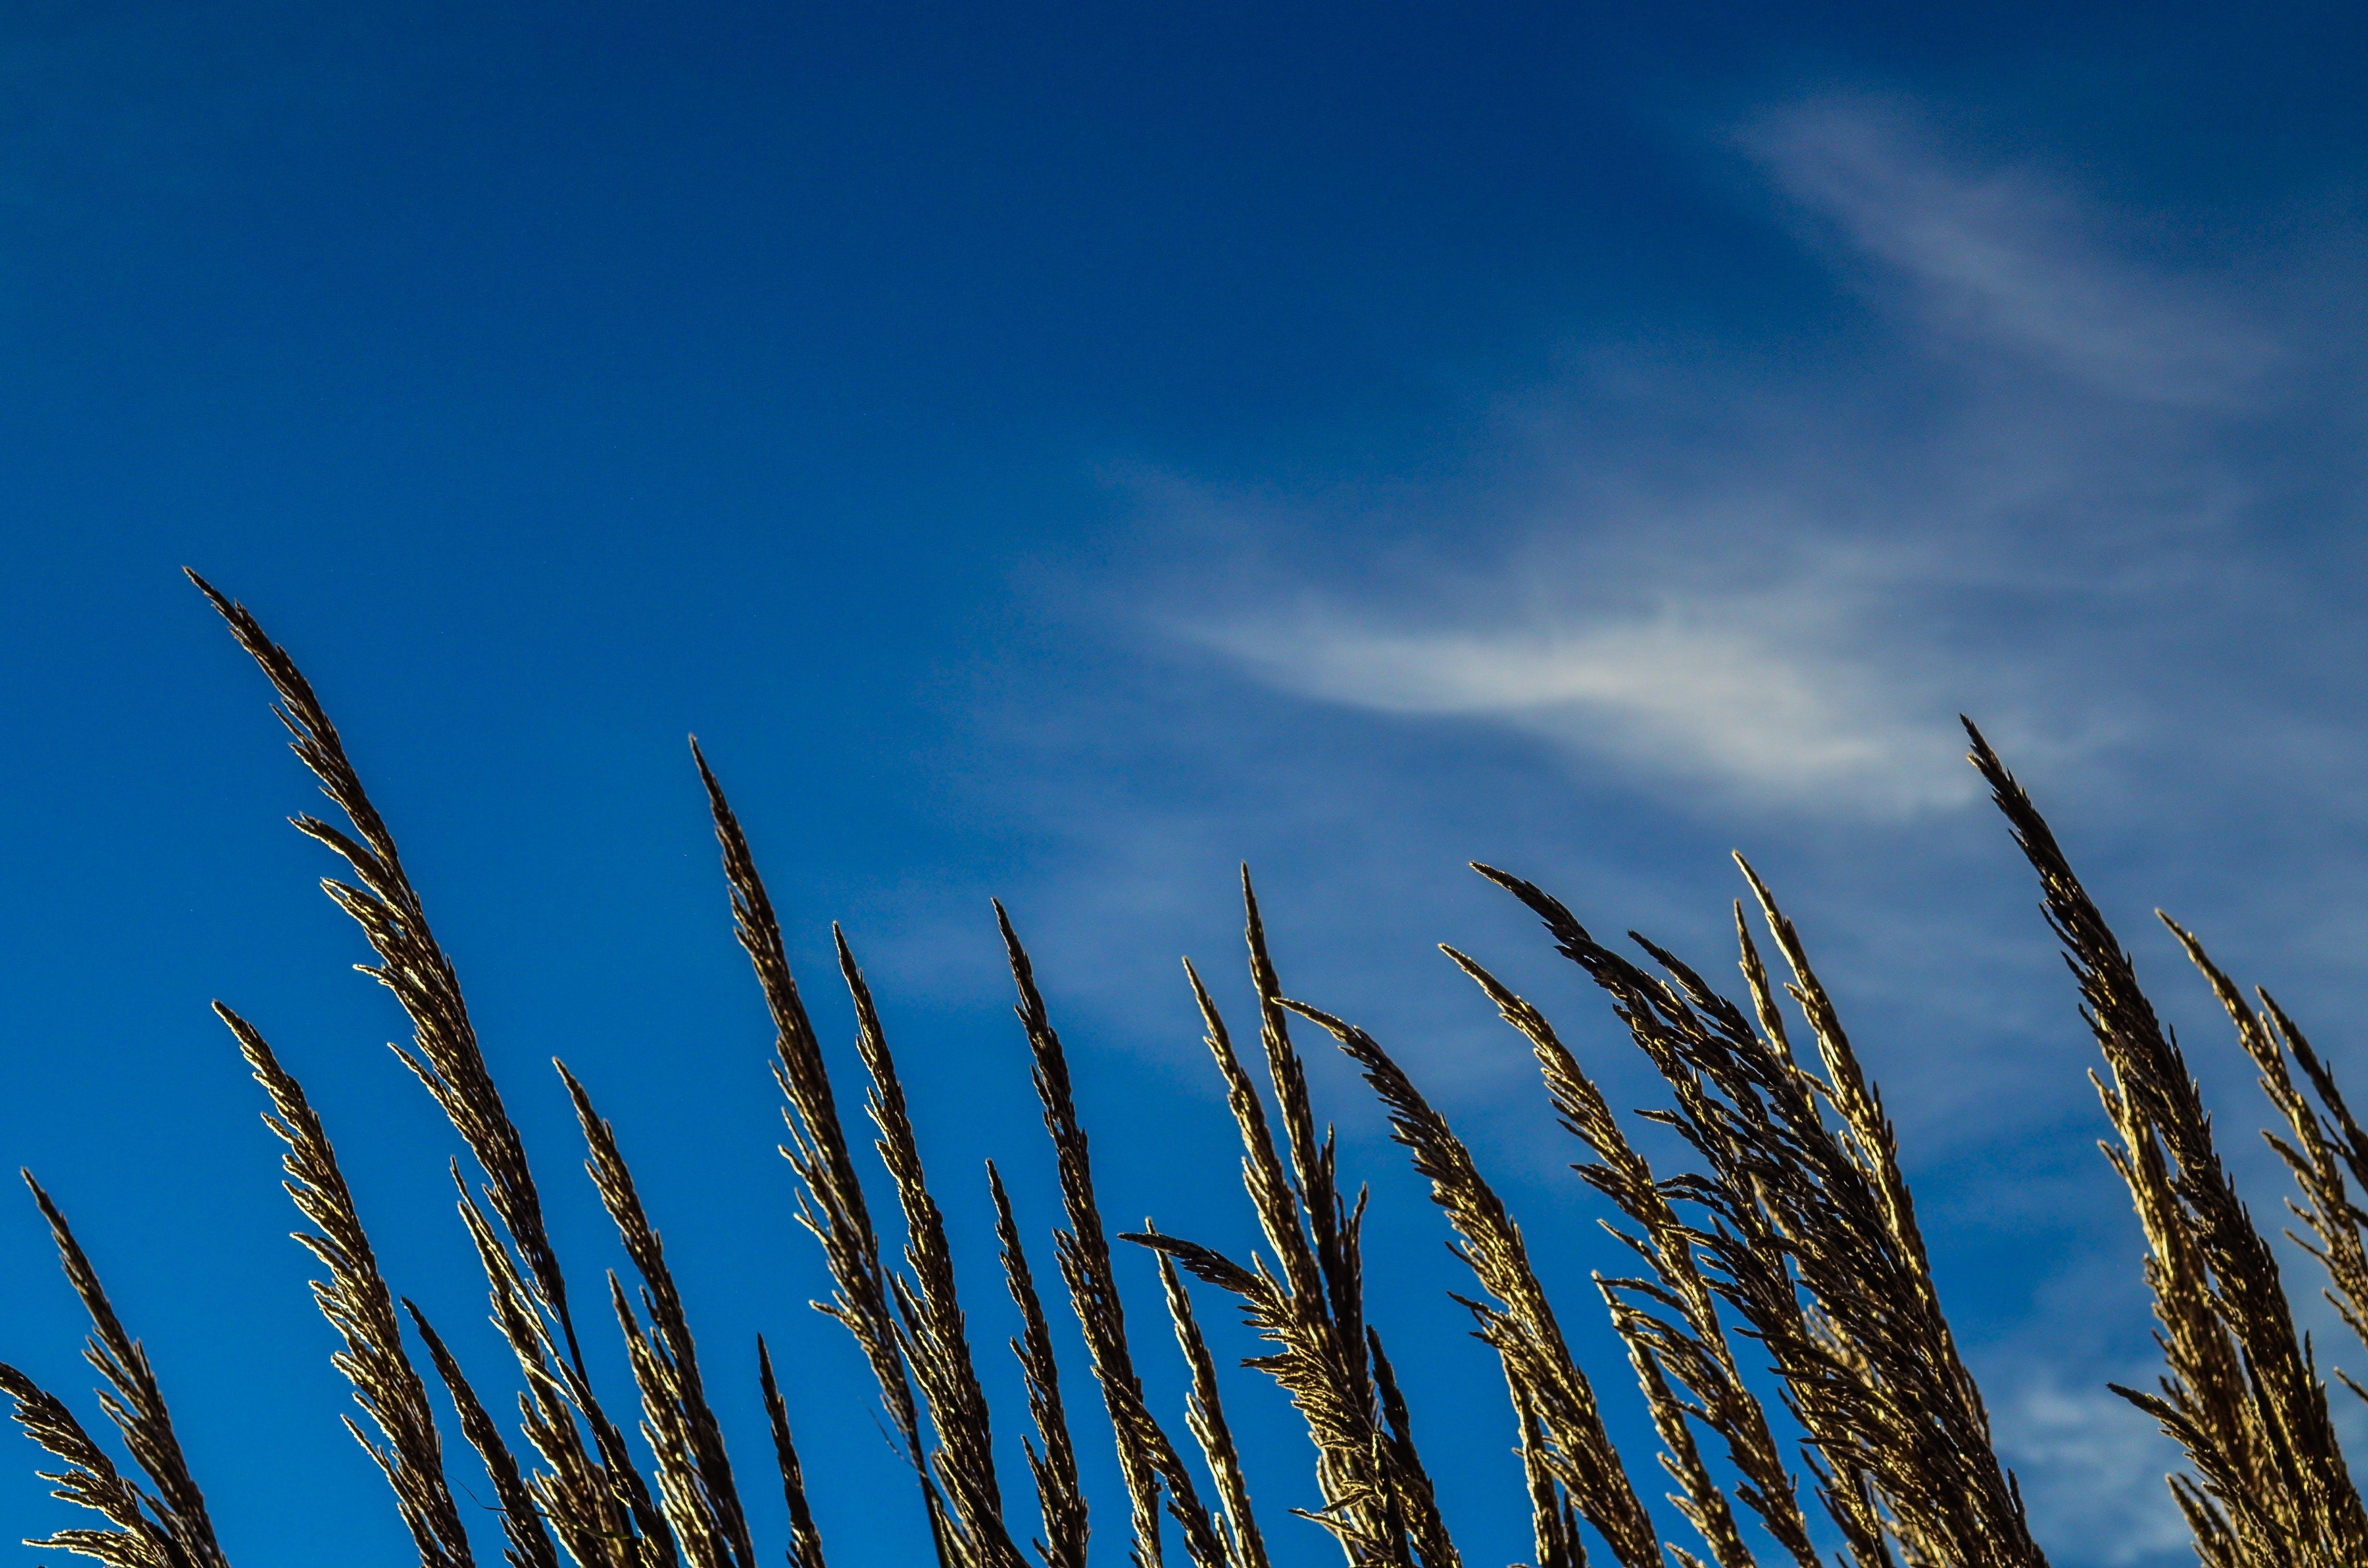 Green Wheat Under Clear Blue Sky